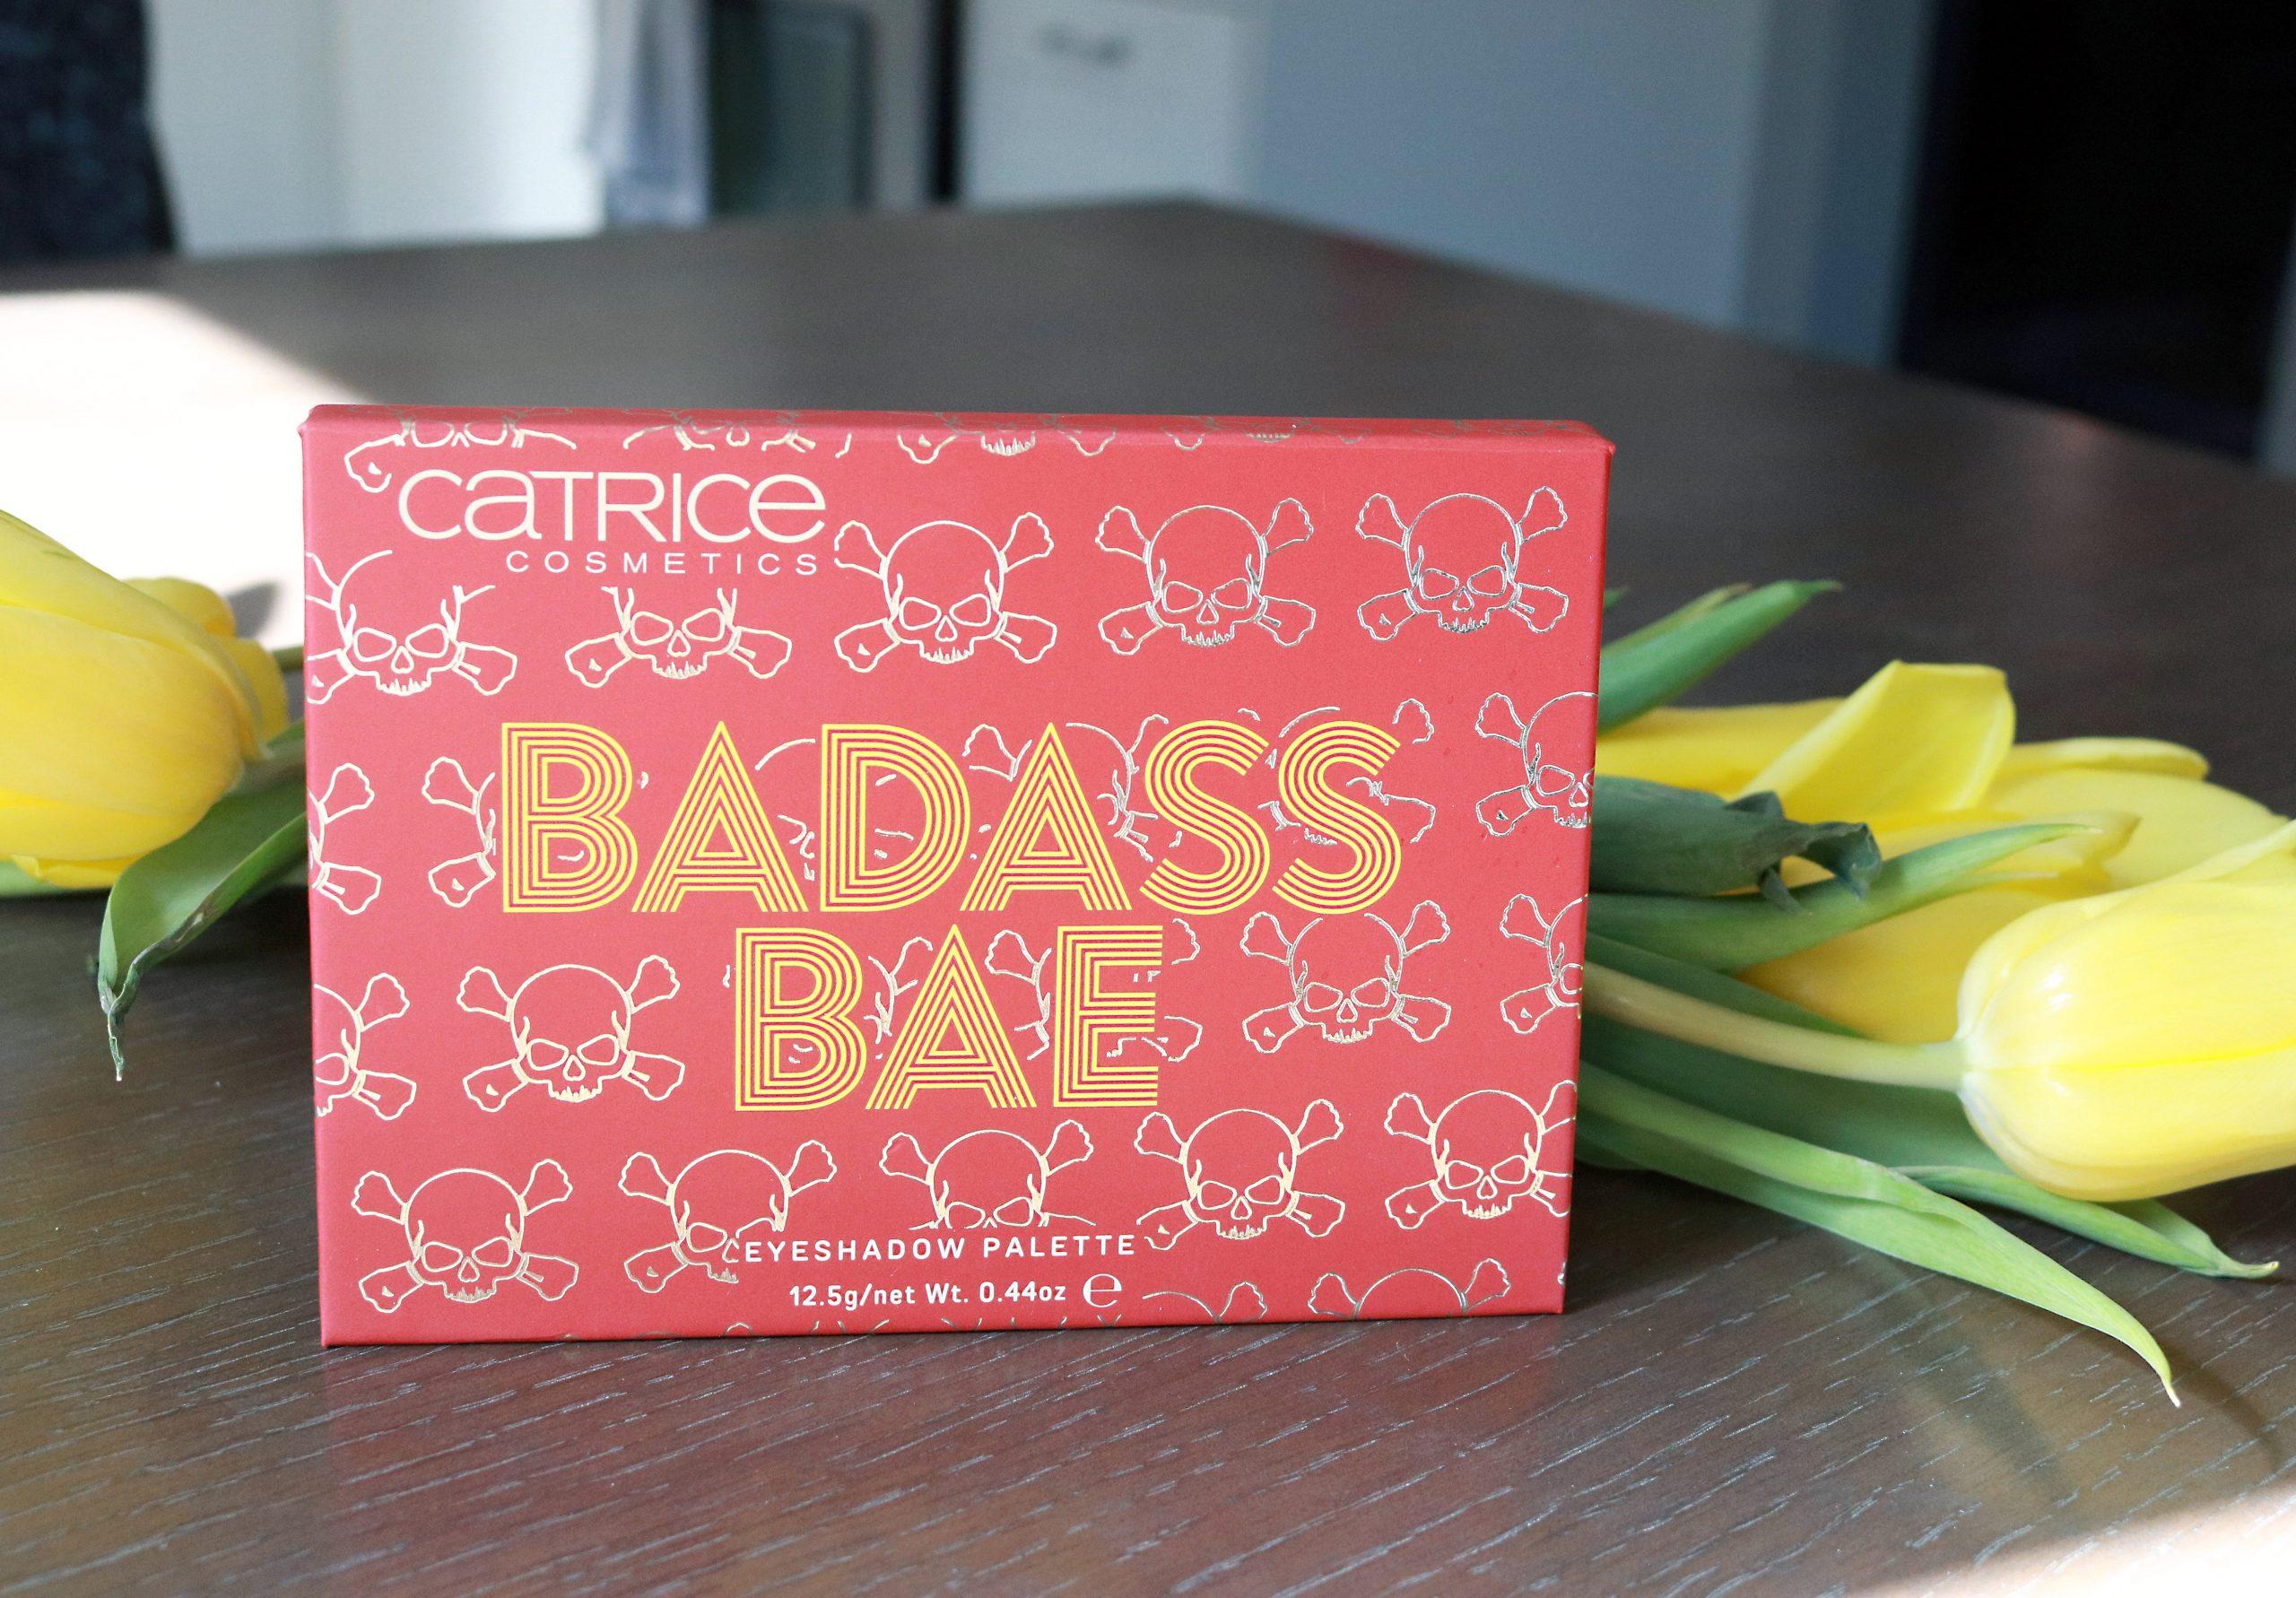 CATRICE Badass Bae Eyeshadow Palette